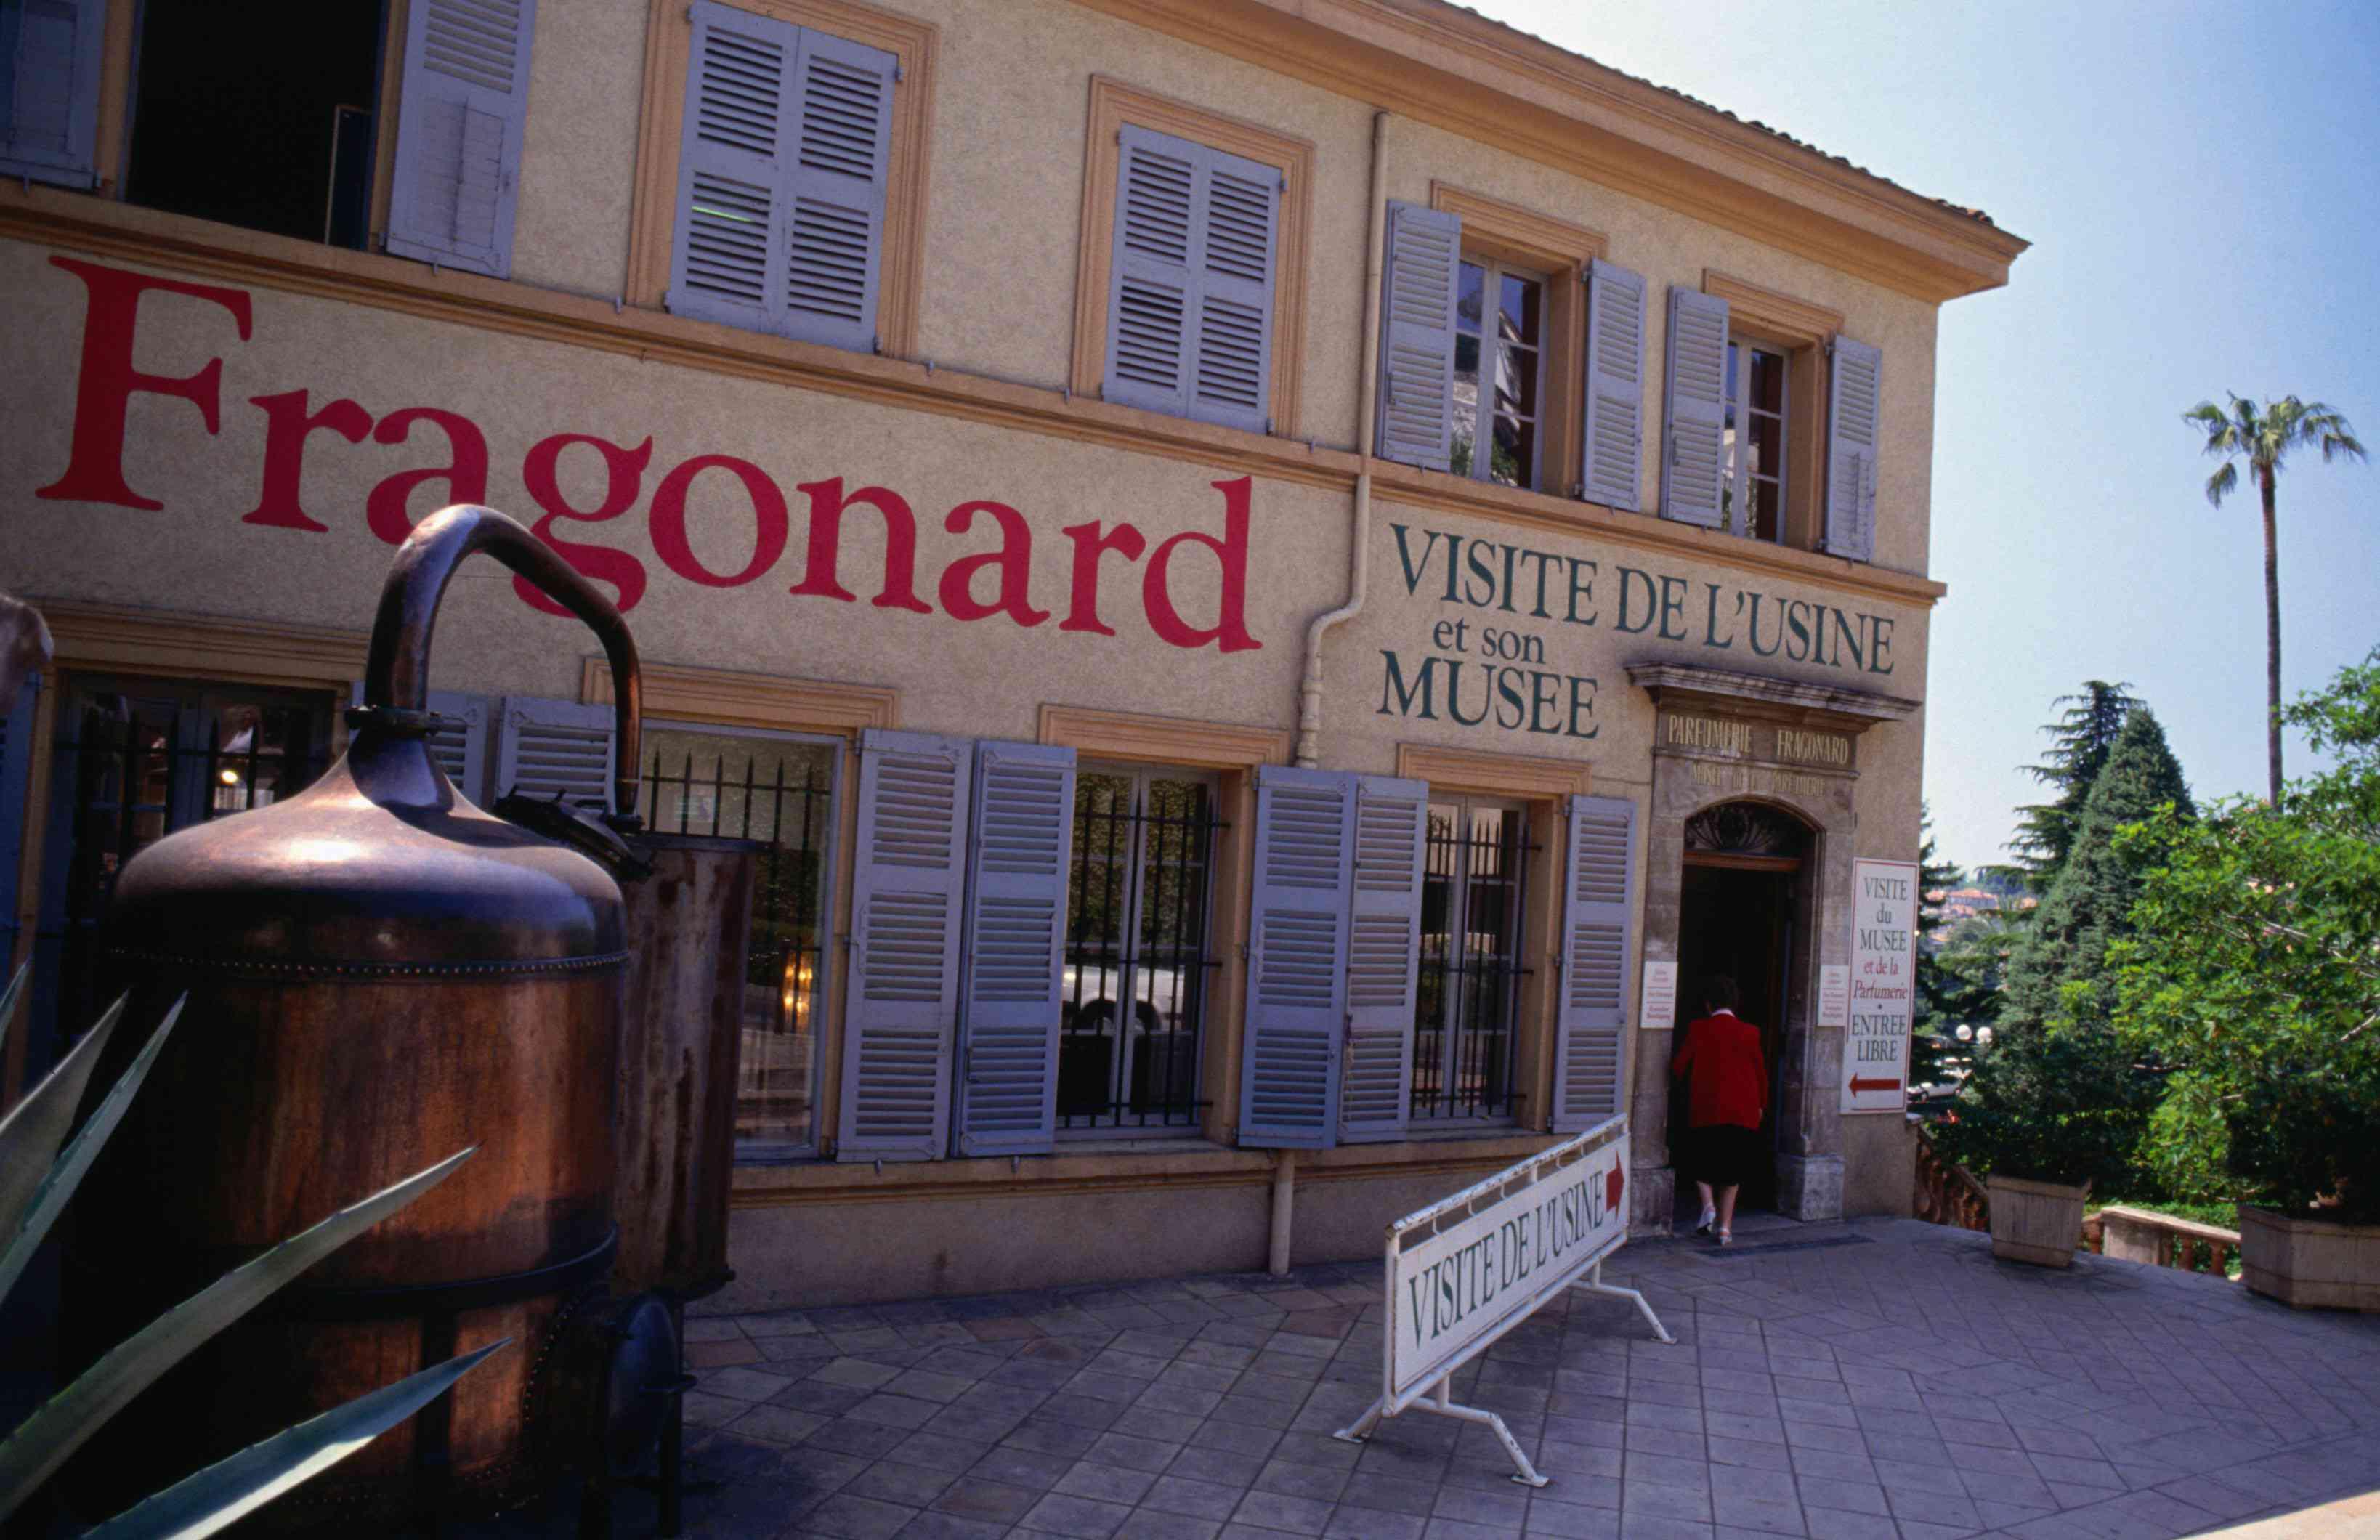 Fragonard Museum in Grasse, France